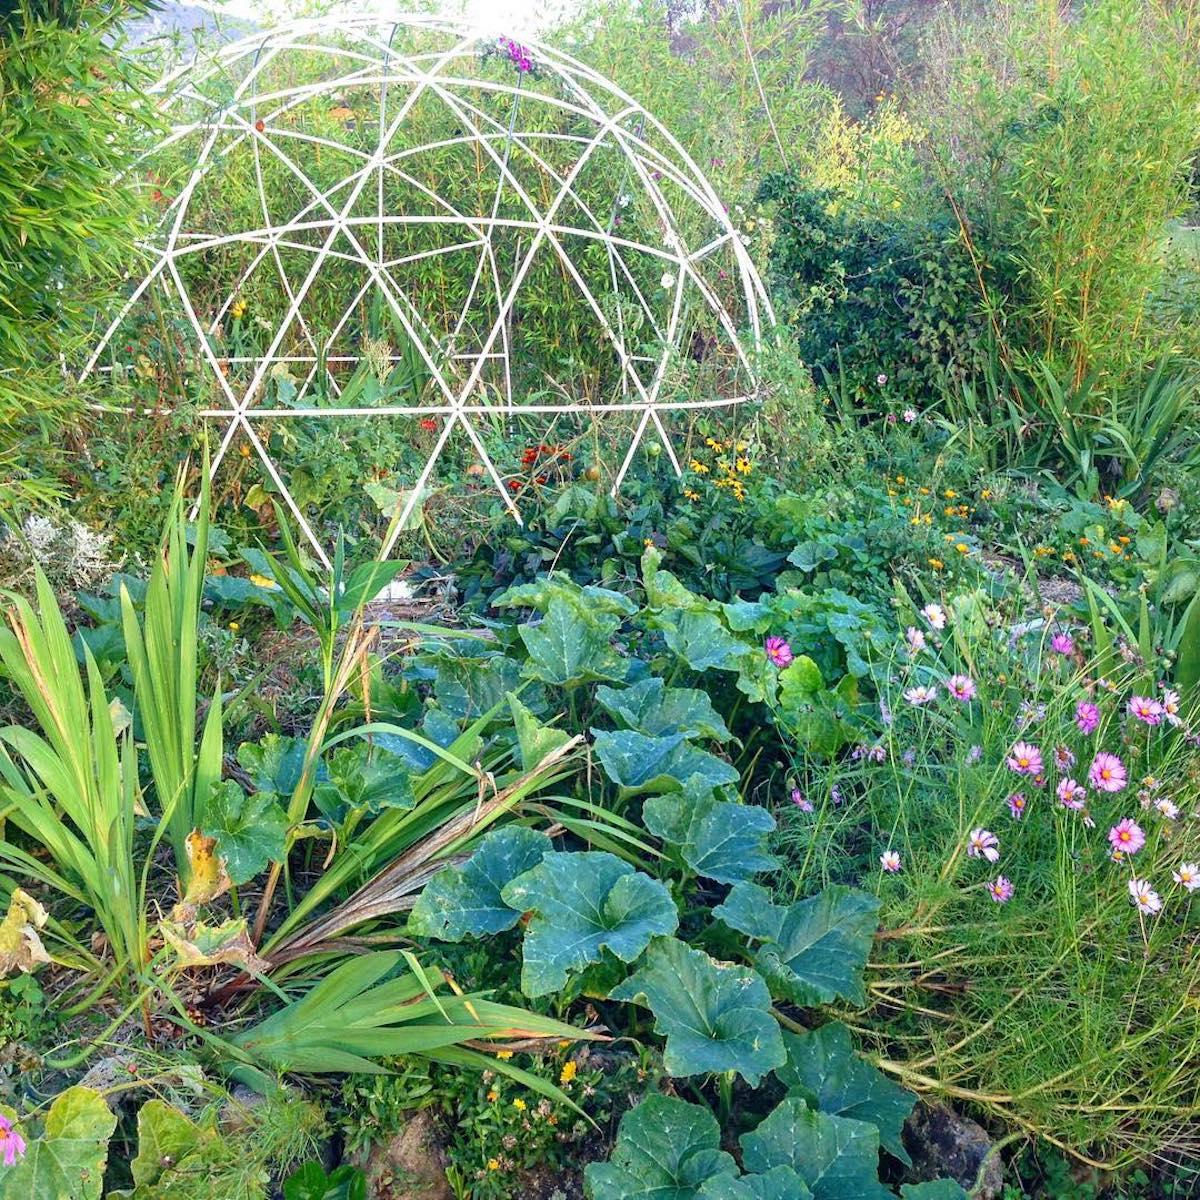 jardin potager serre bulle de jardin résistante tendance couverture transparente déco tendance - clemaroundthecorner